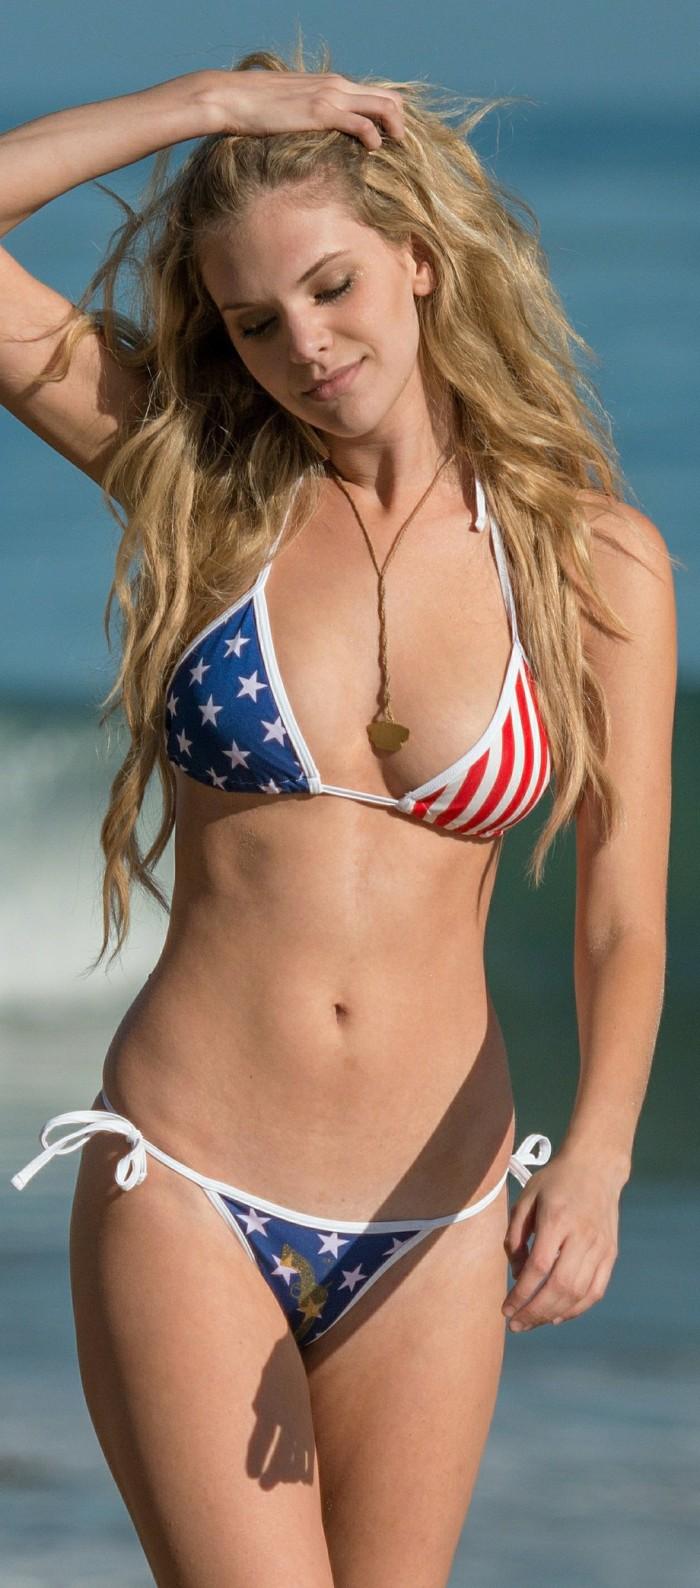 usa-bikinis-021-07042015.jpg (317 KB)